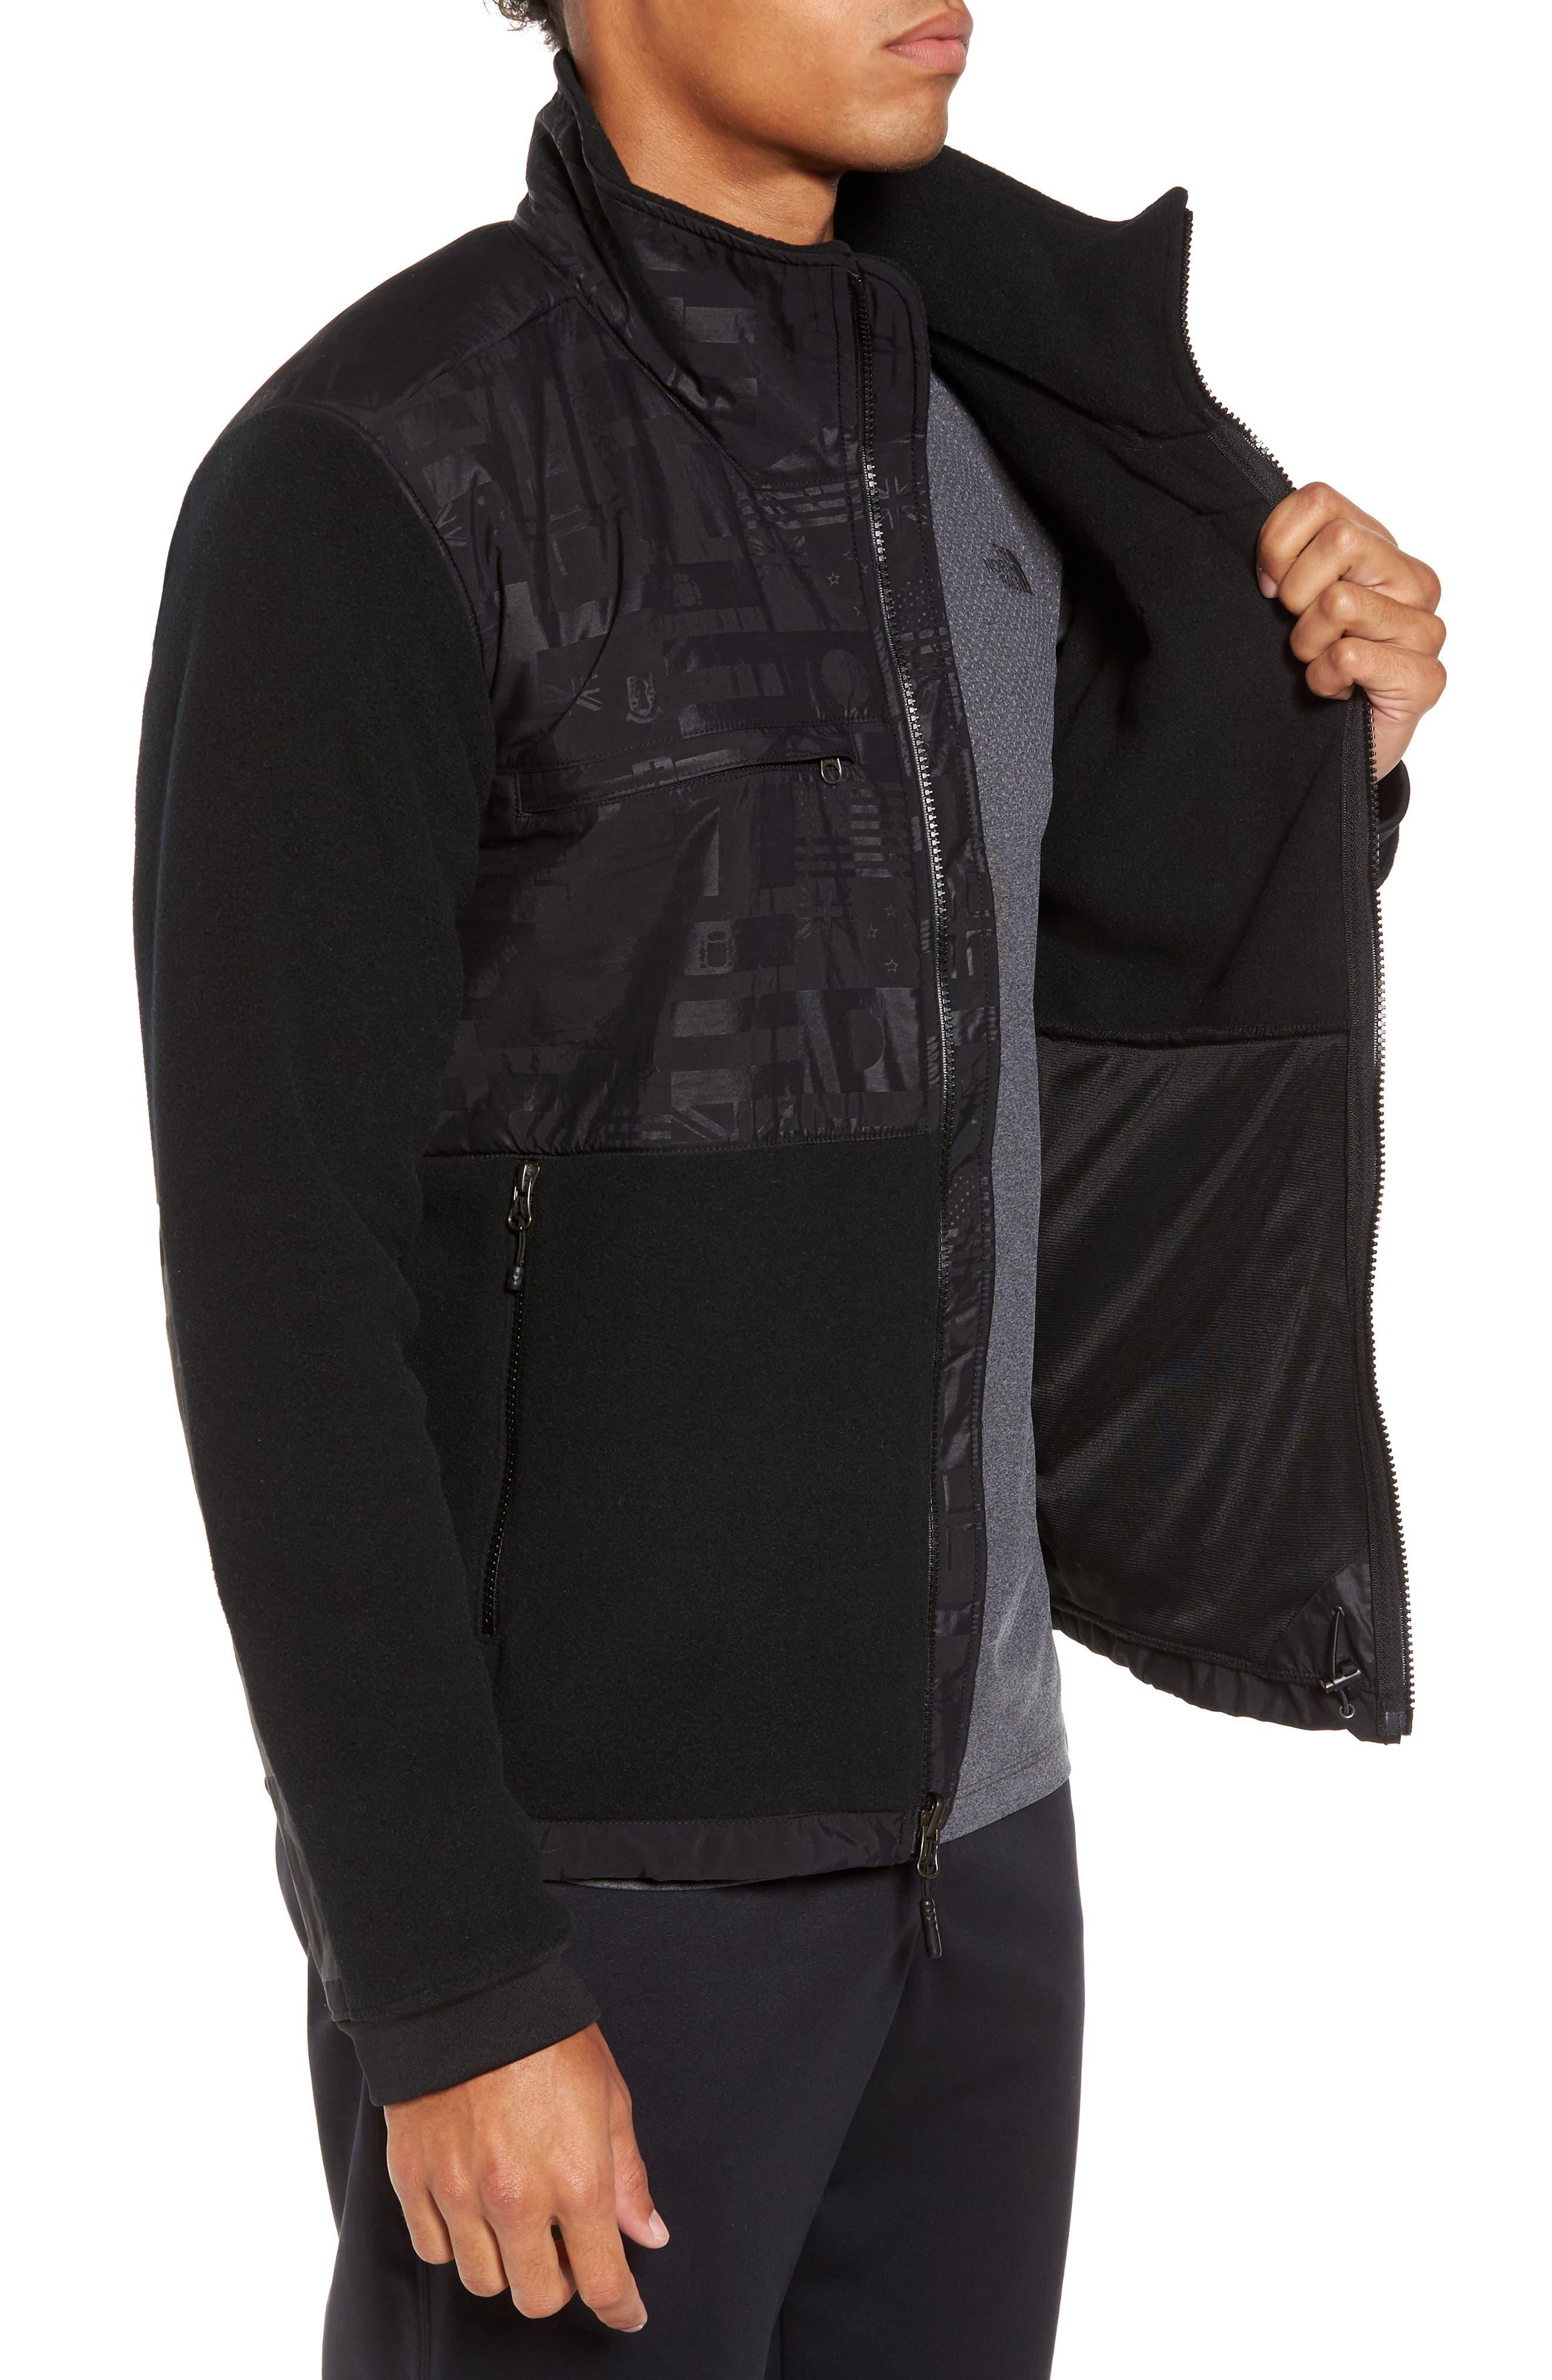 Denali 2 Polartec<sup>®</sup> Fleece Hoodie,                             Alternate thumbnail 3, color,                             Black